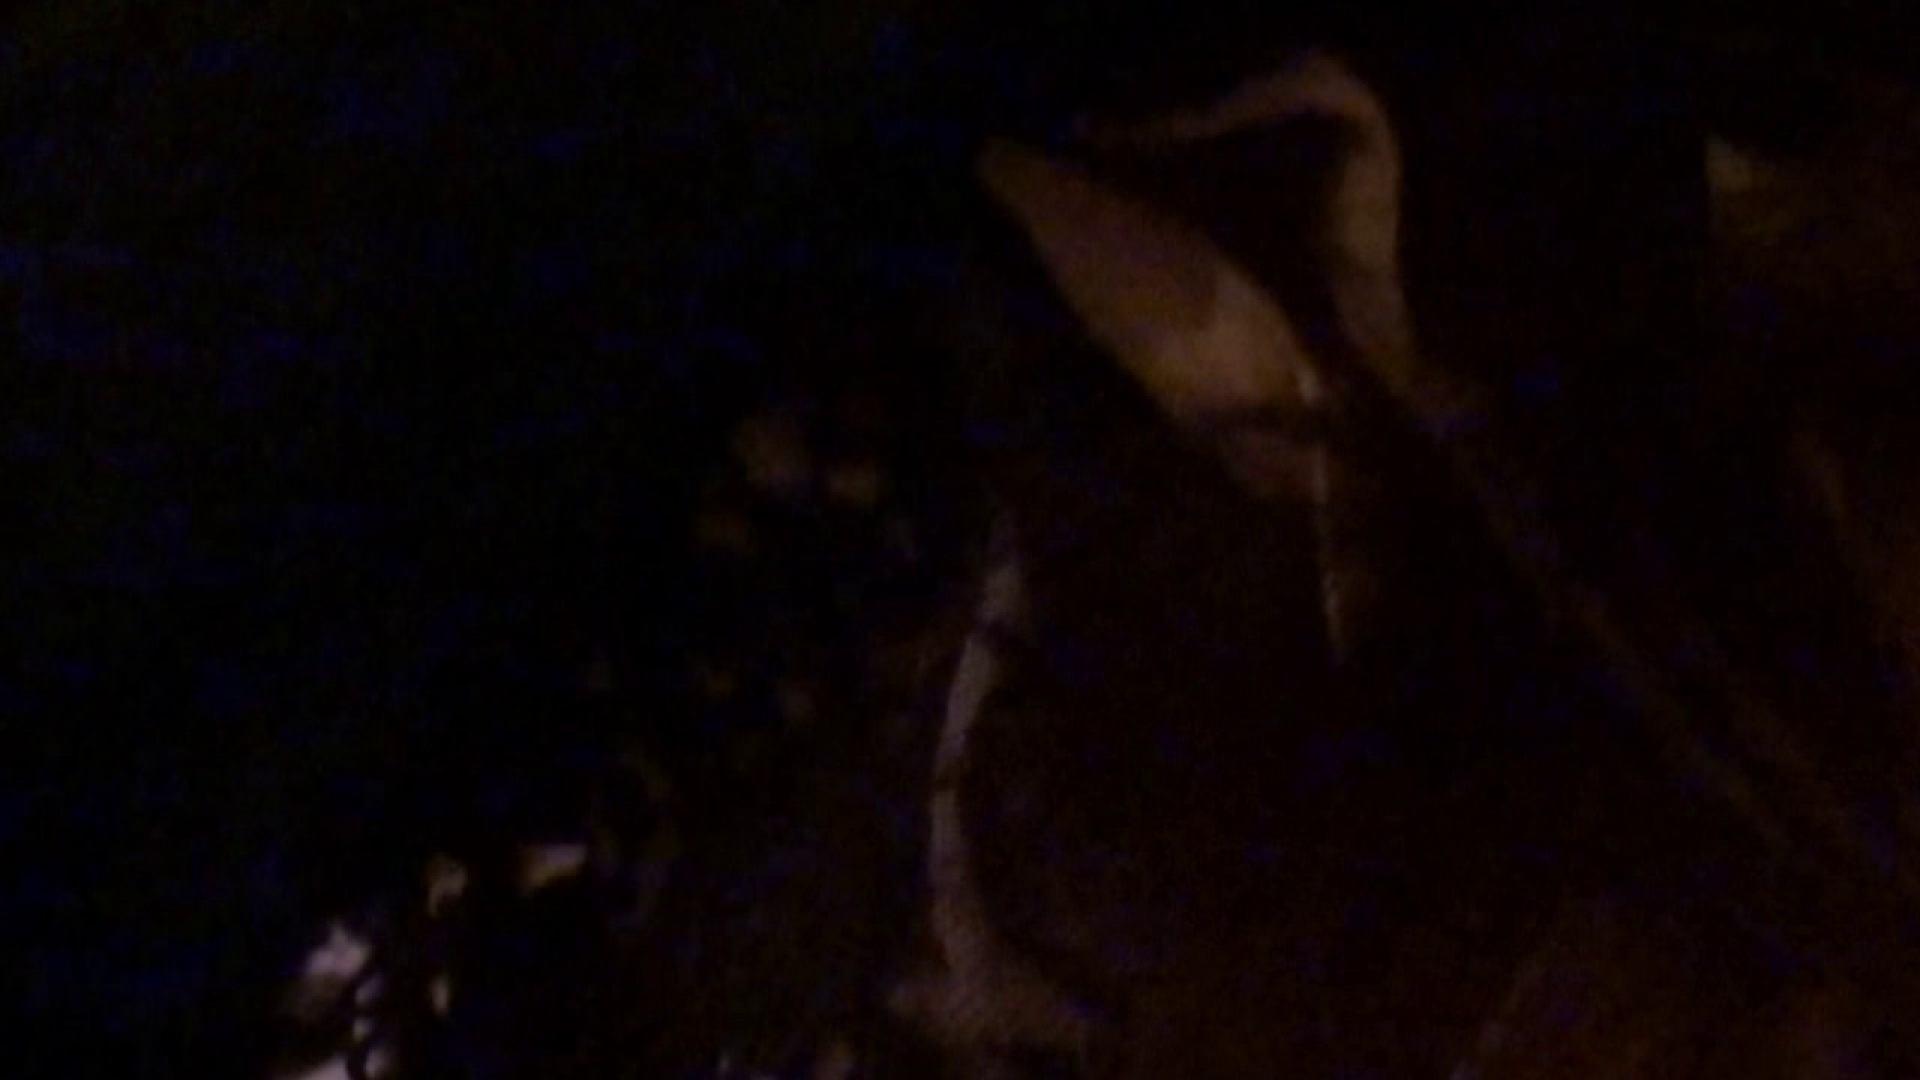 vol.27 【SKちゃん(ホテル)】ガールズバー店員 19歳 ホテルでエッチ 盗撮セックス無修正動画無料 97pic 5